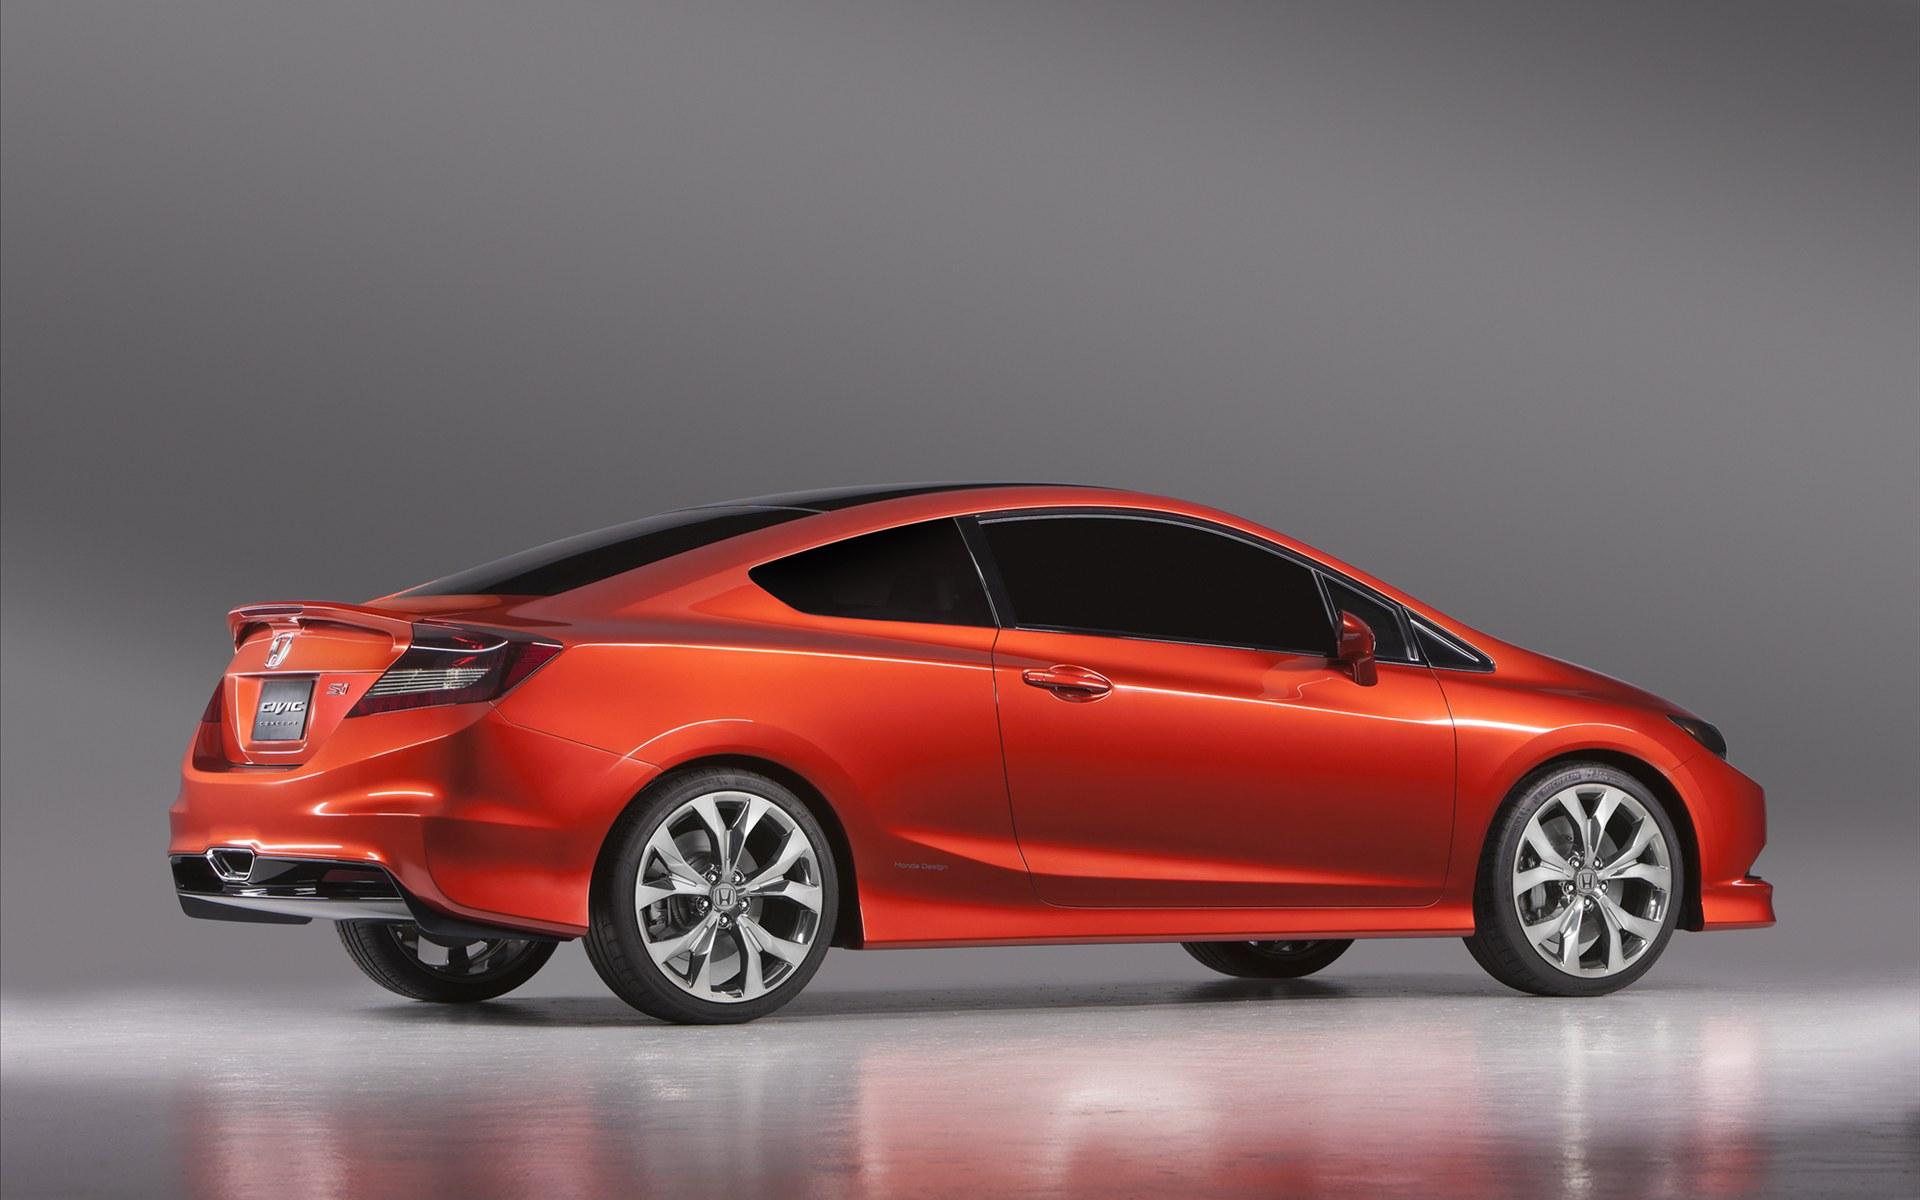 Red Honda Car Images Free Download Image Of